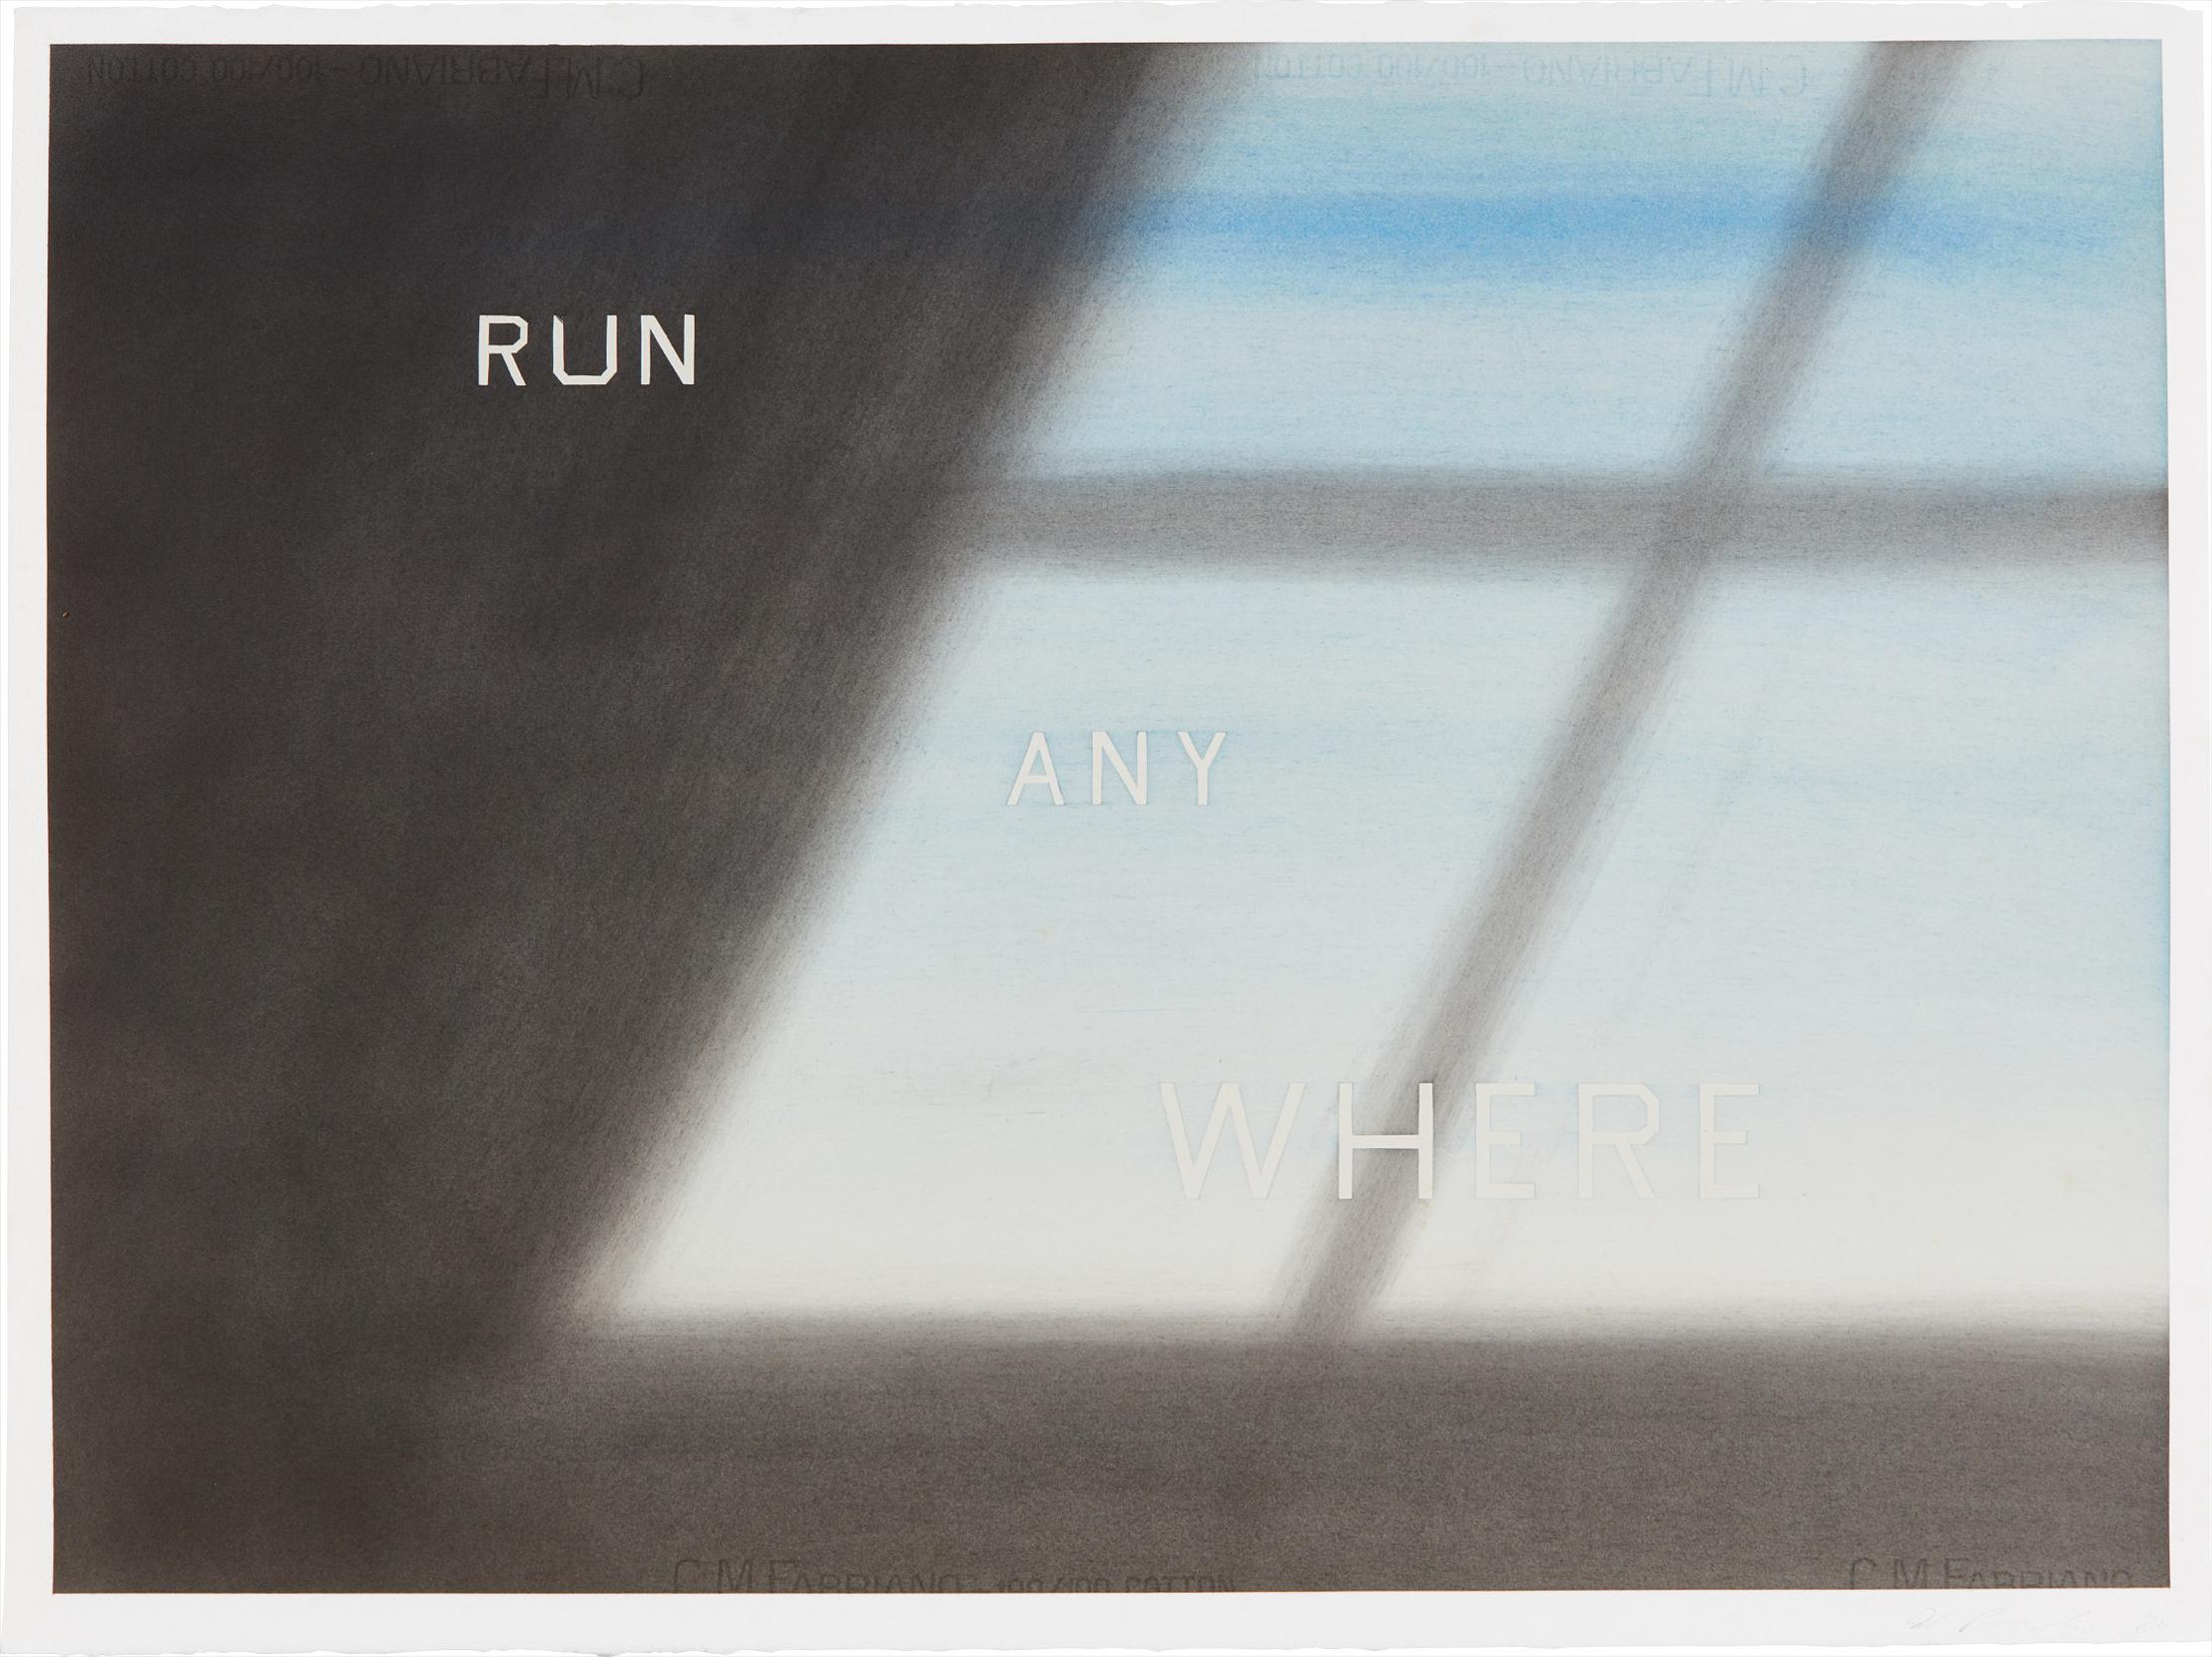 Ed Ruscha-Run Any Where-1984